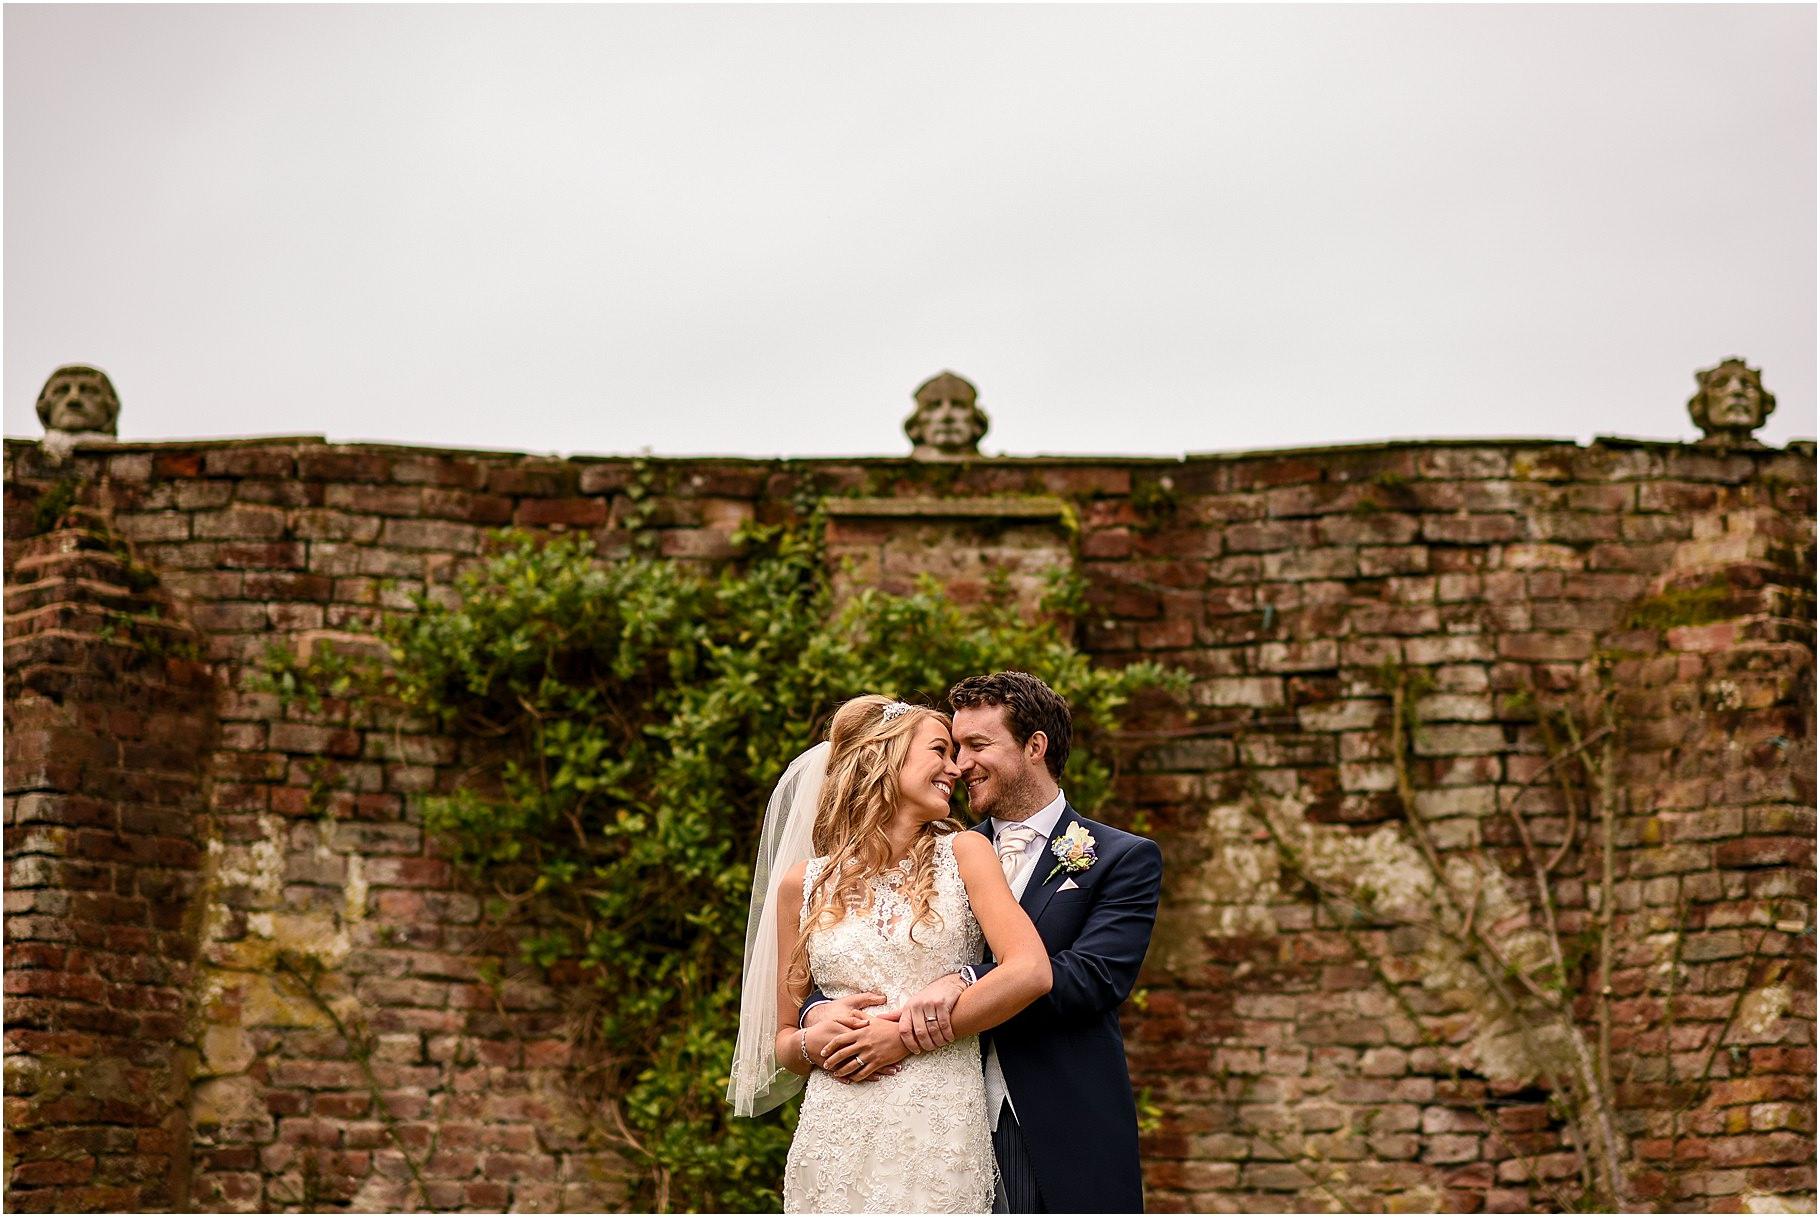 dan-wootton-photography-2017-weddings-091.jpg